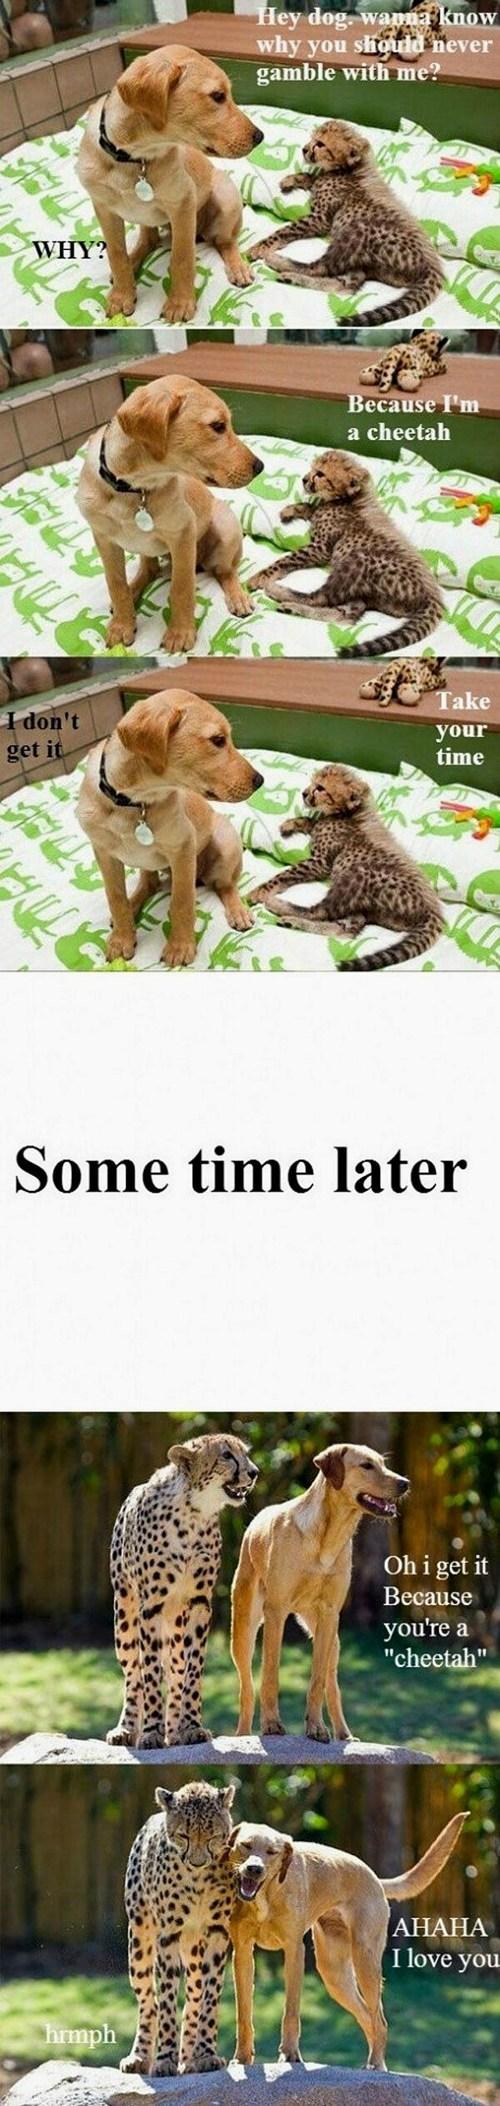 i-dont-get-it dogs Interspecies Love idgi puns cheetahs cheating slow stupid - 6890988800